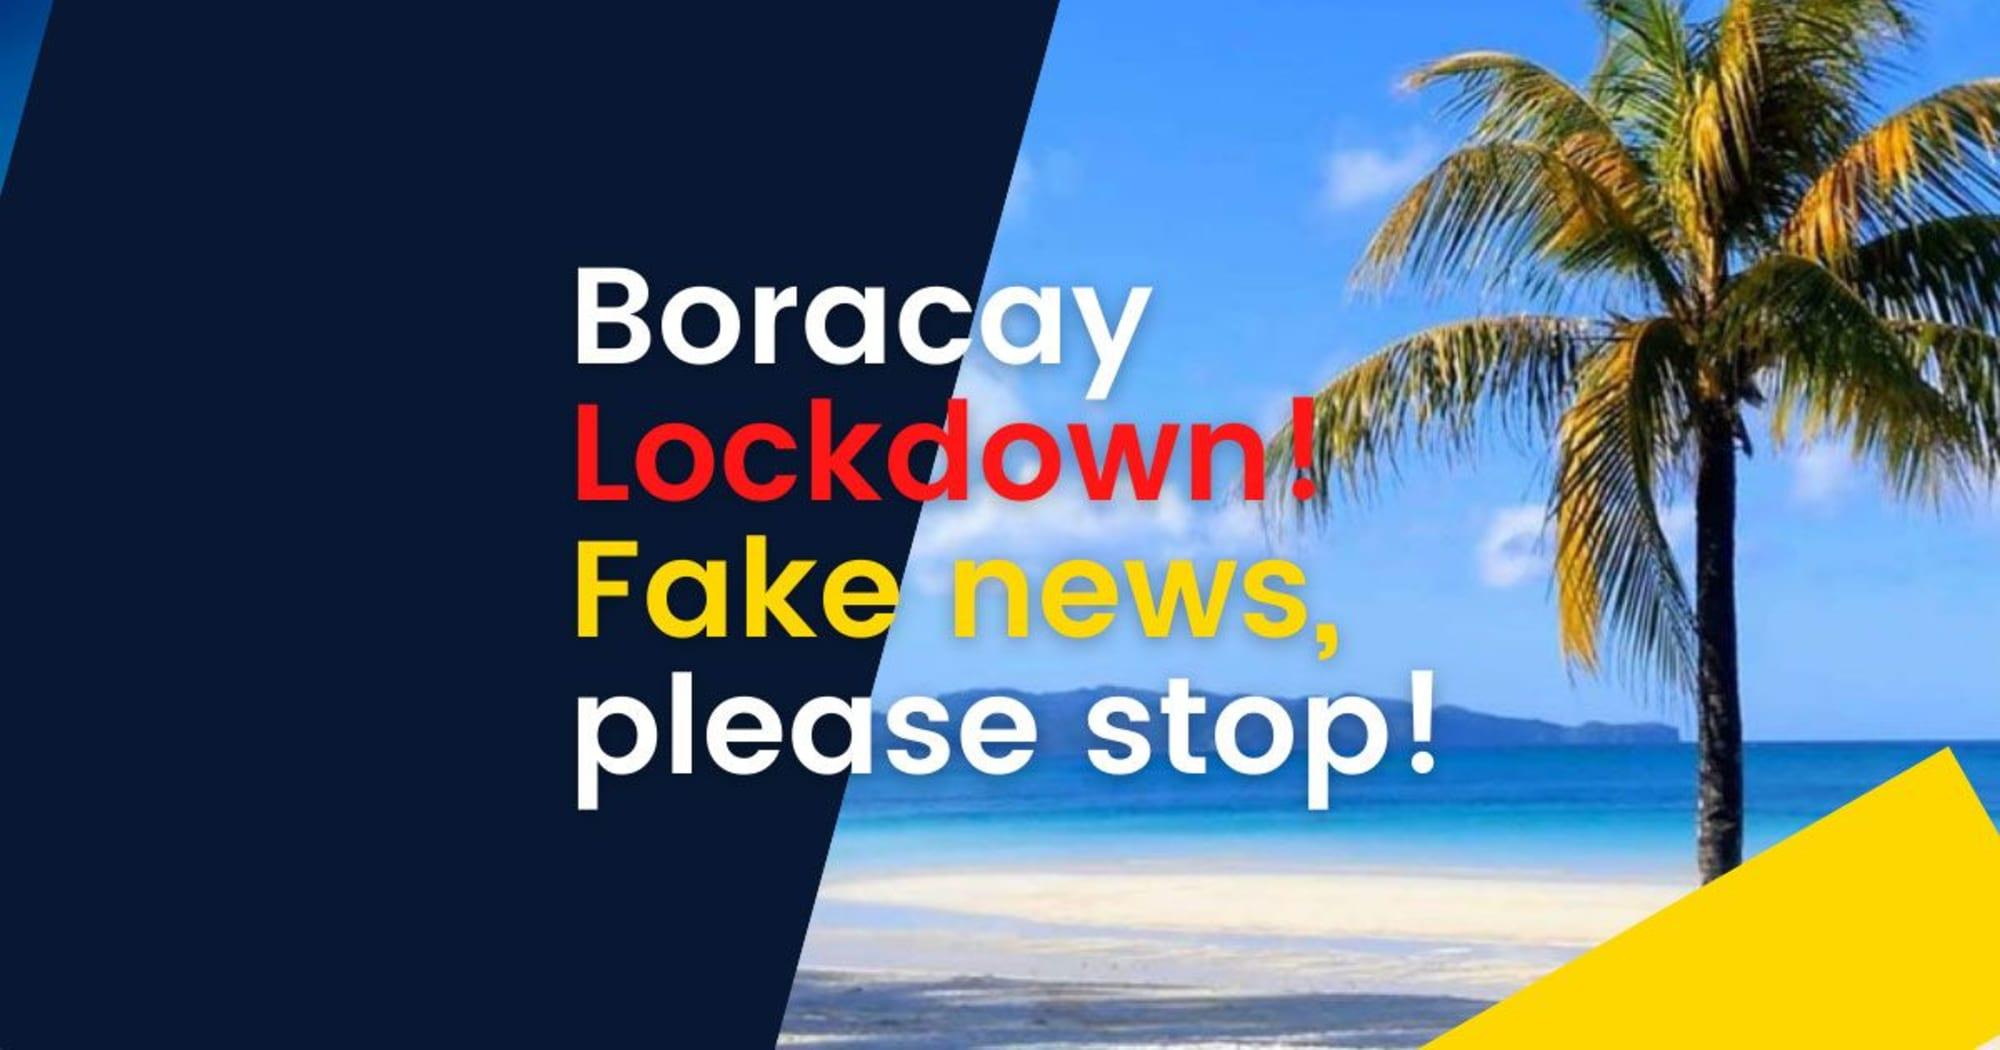 Boracay lockdown Fake News! -Town Mayor